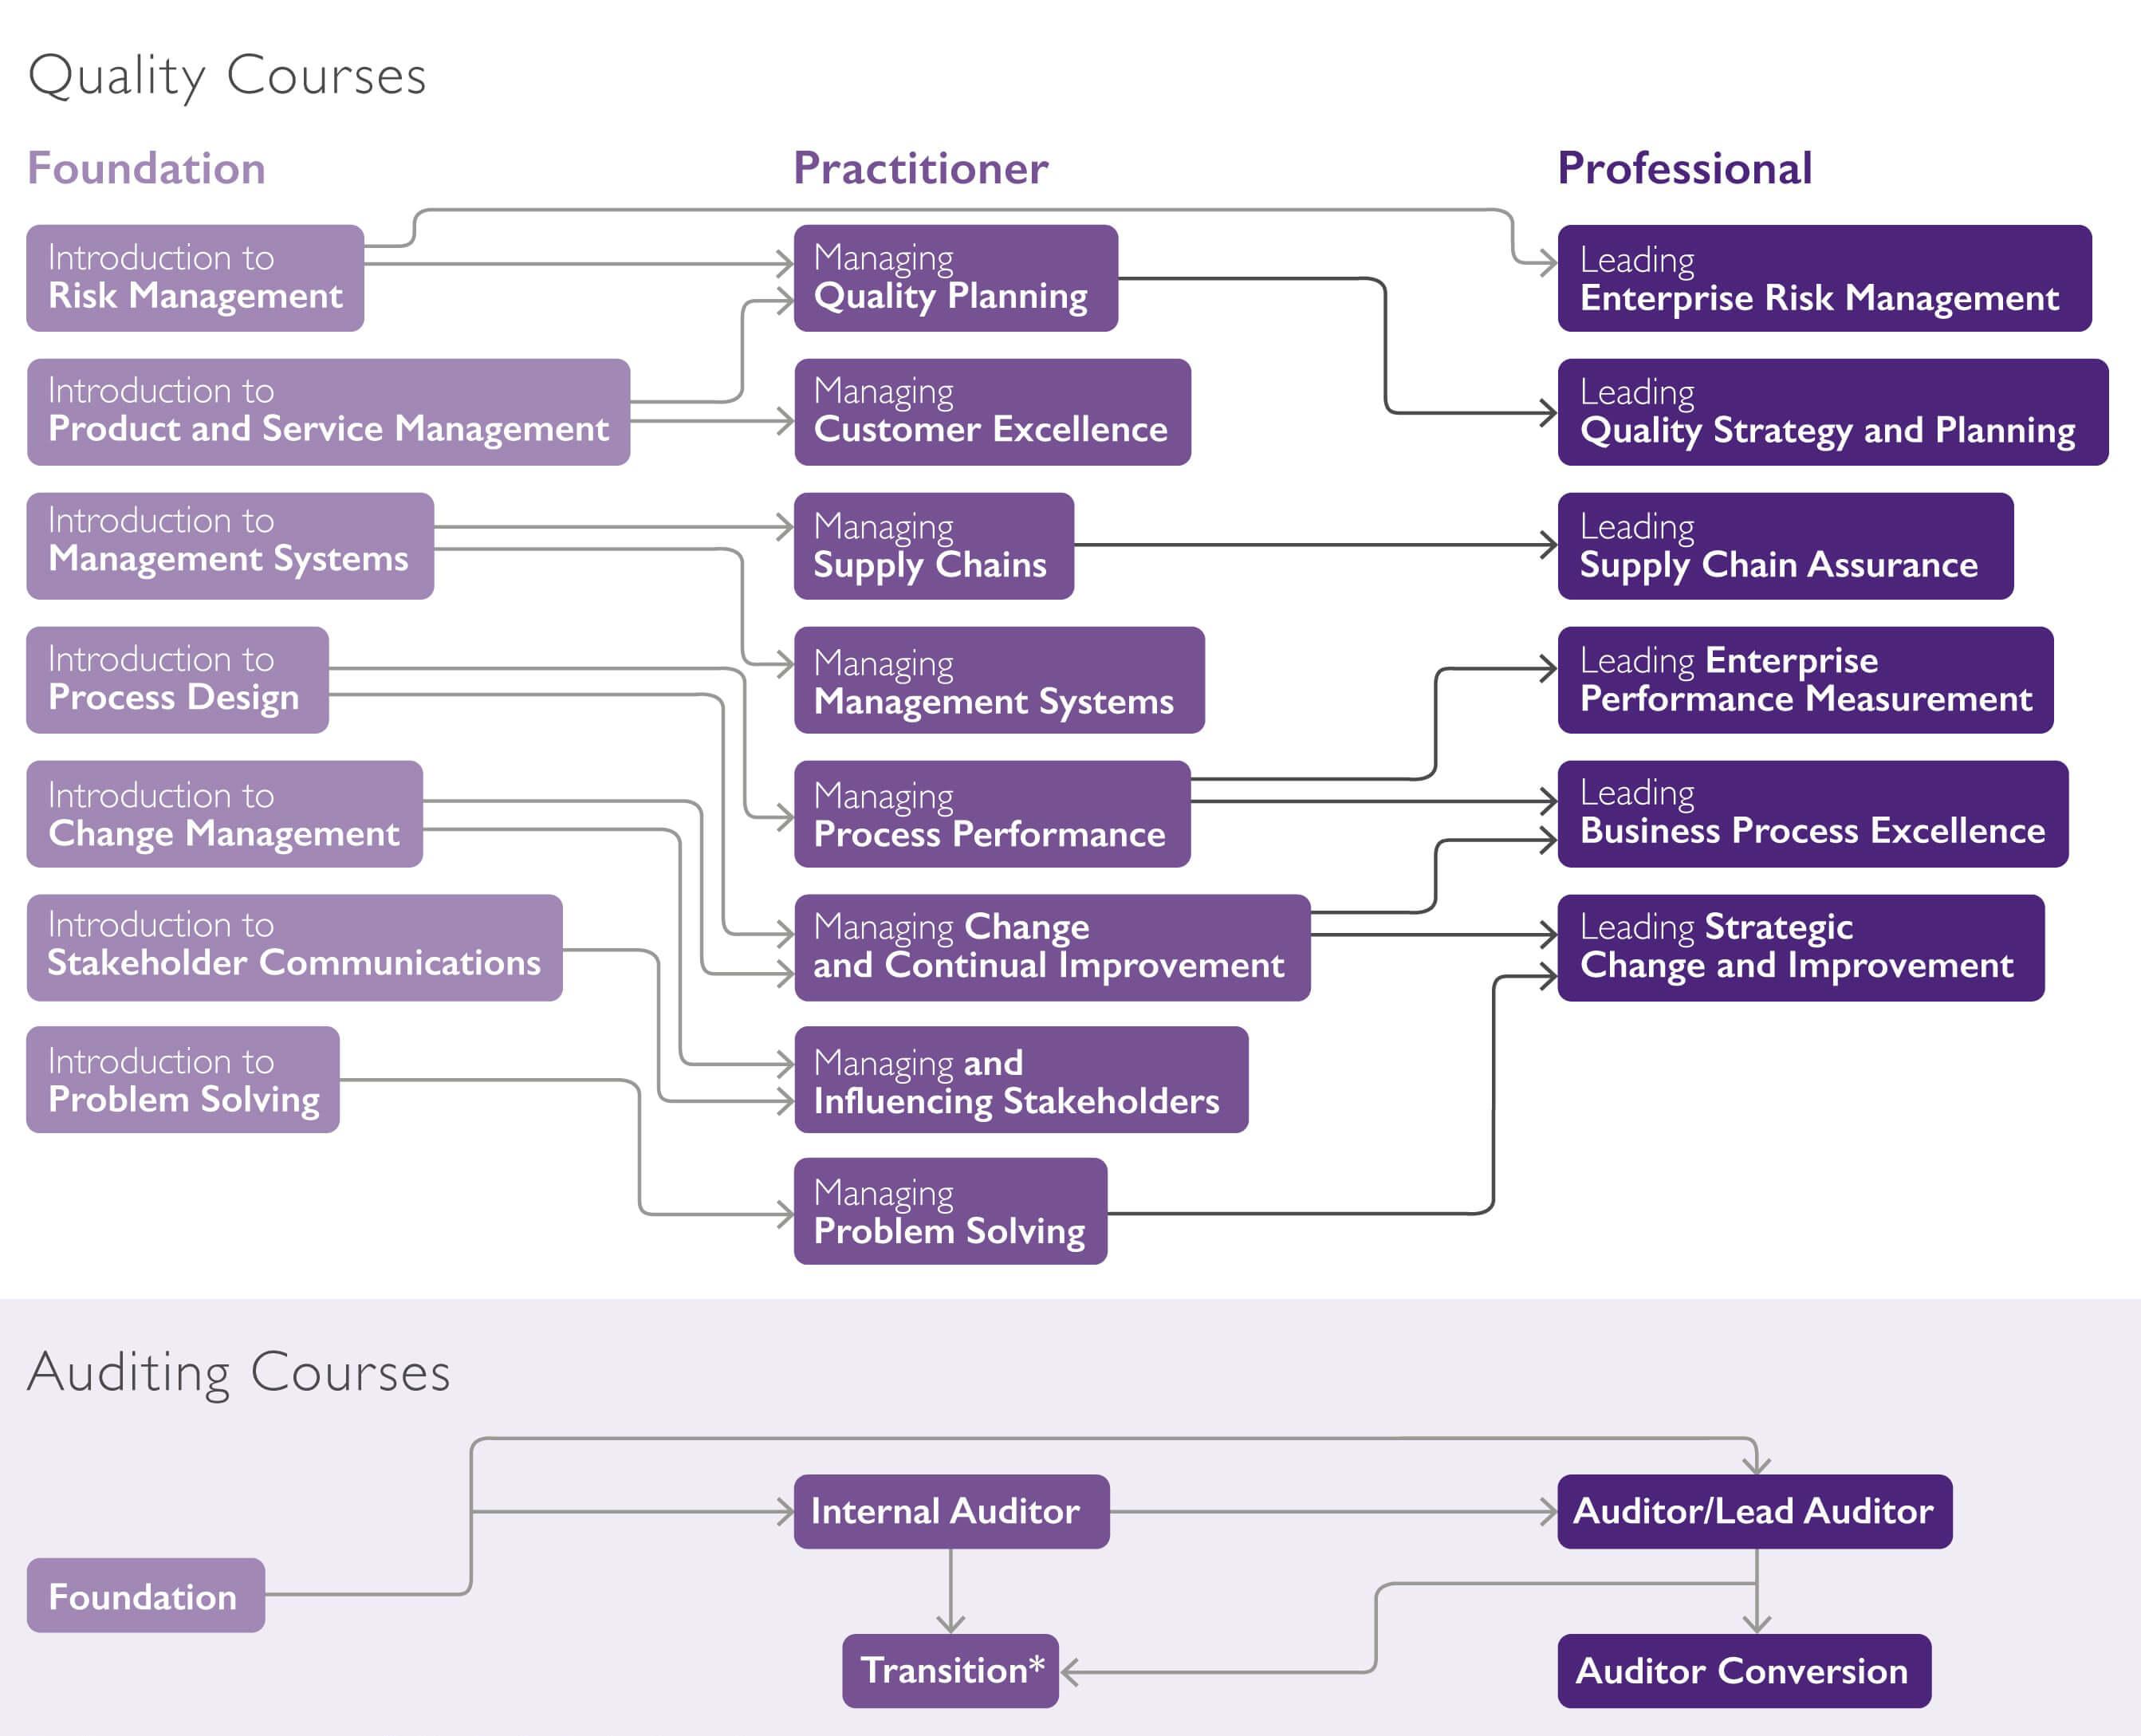 CQI & IRCA Certified Courses - QM&T